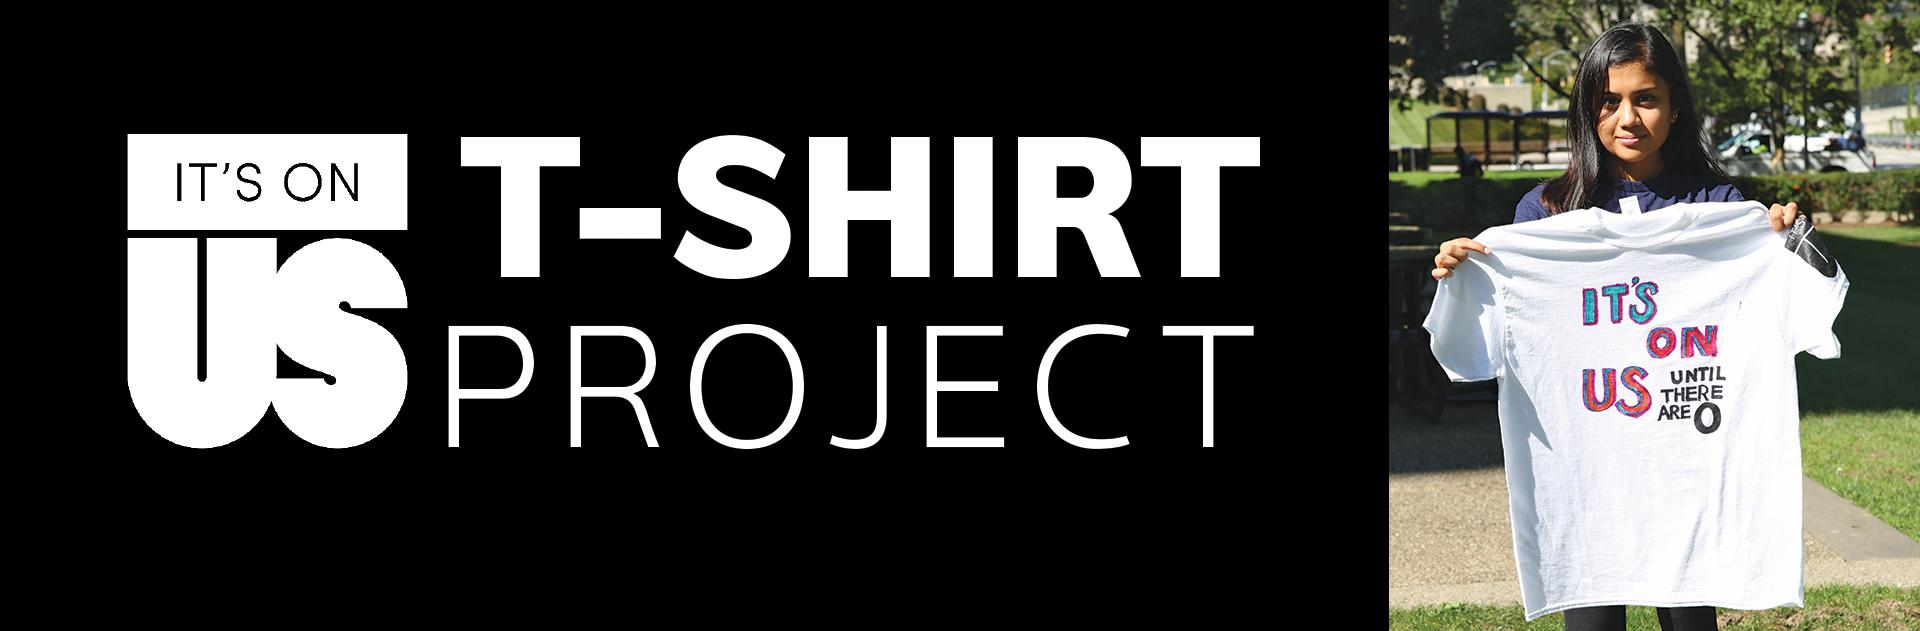 TshirtProject_WebBanner